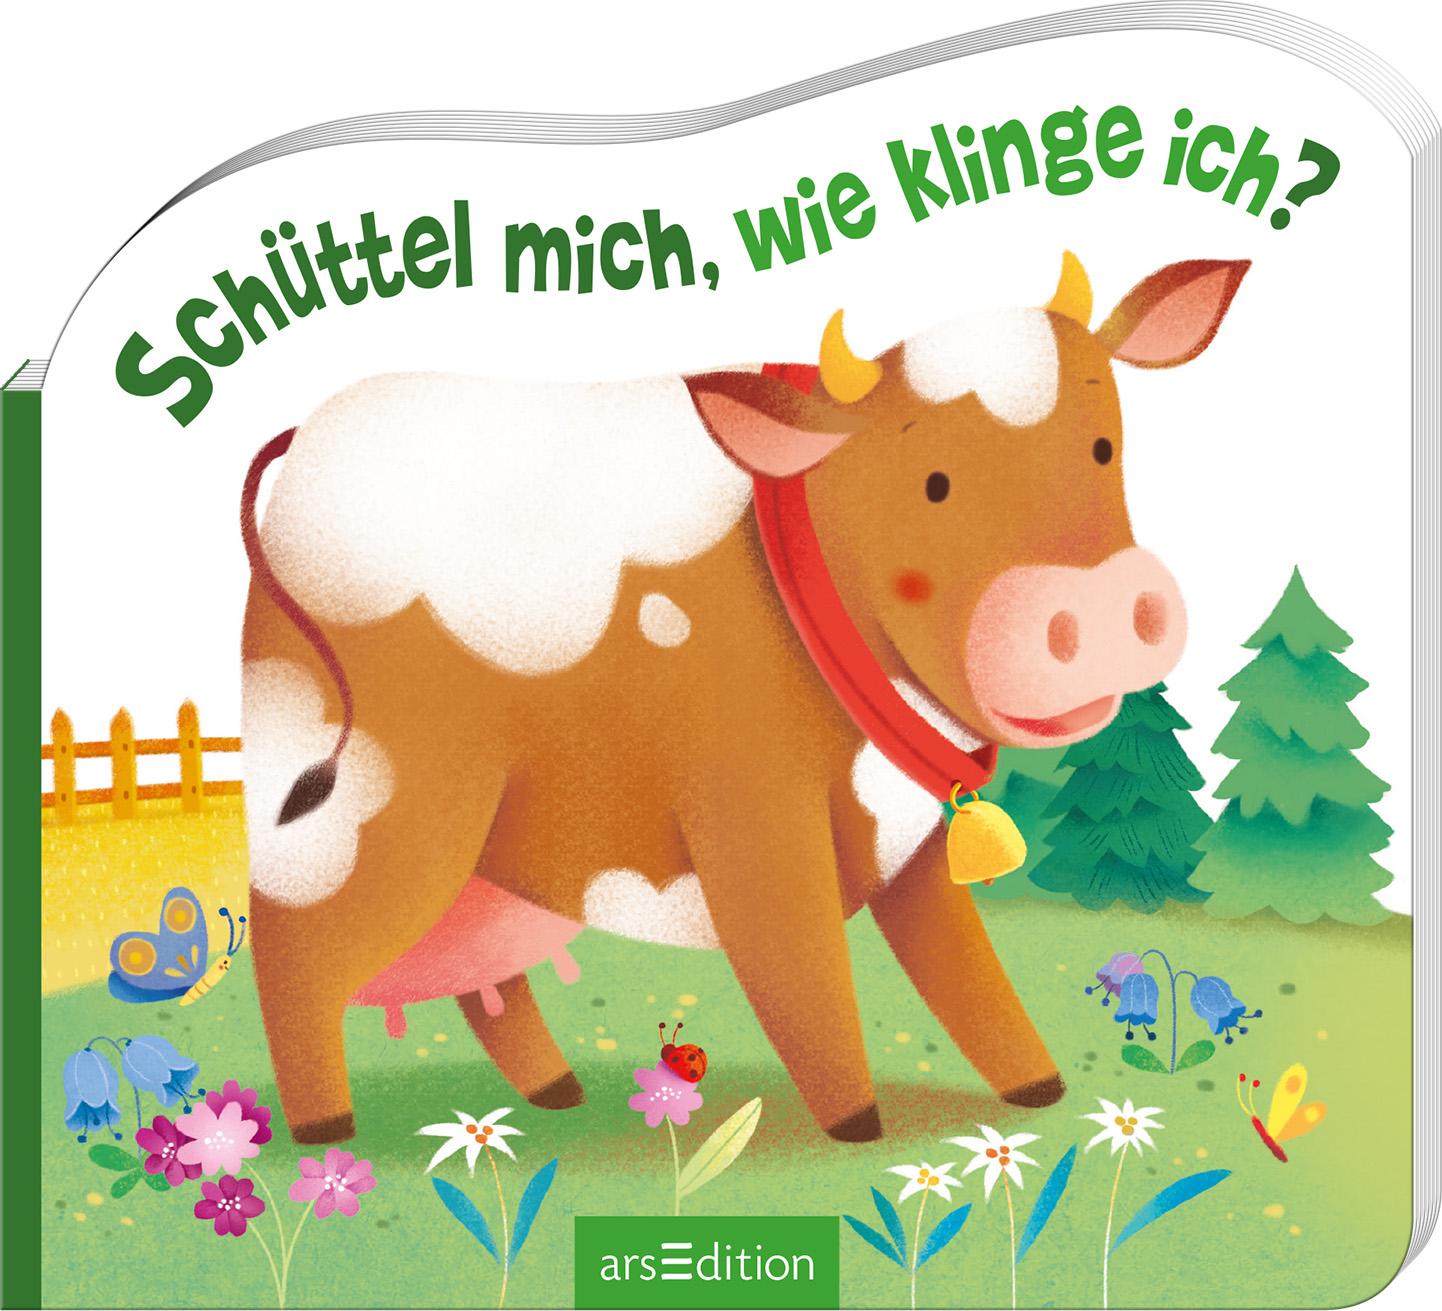 Cow sound book